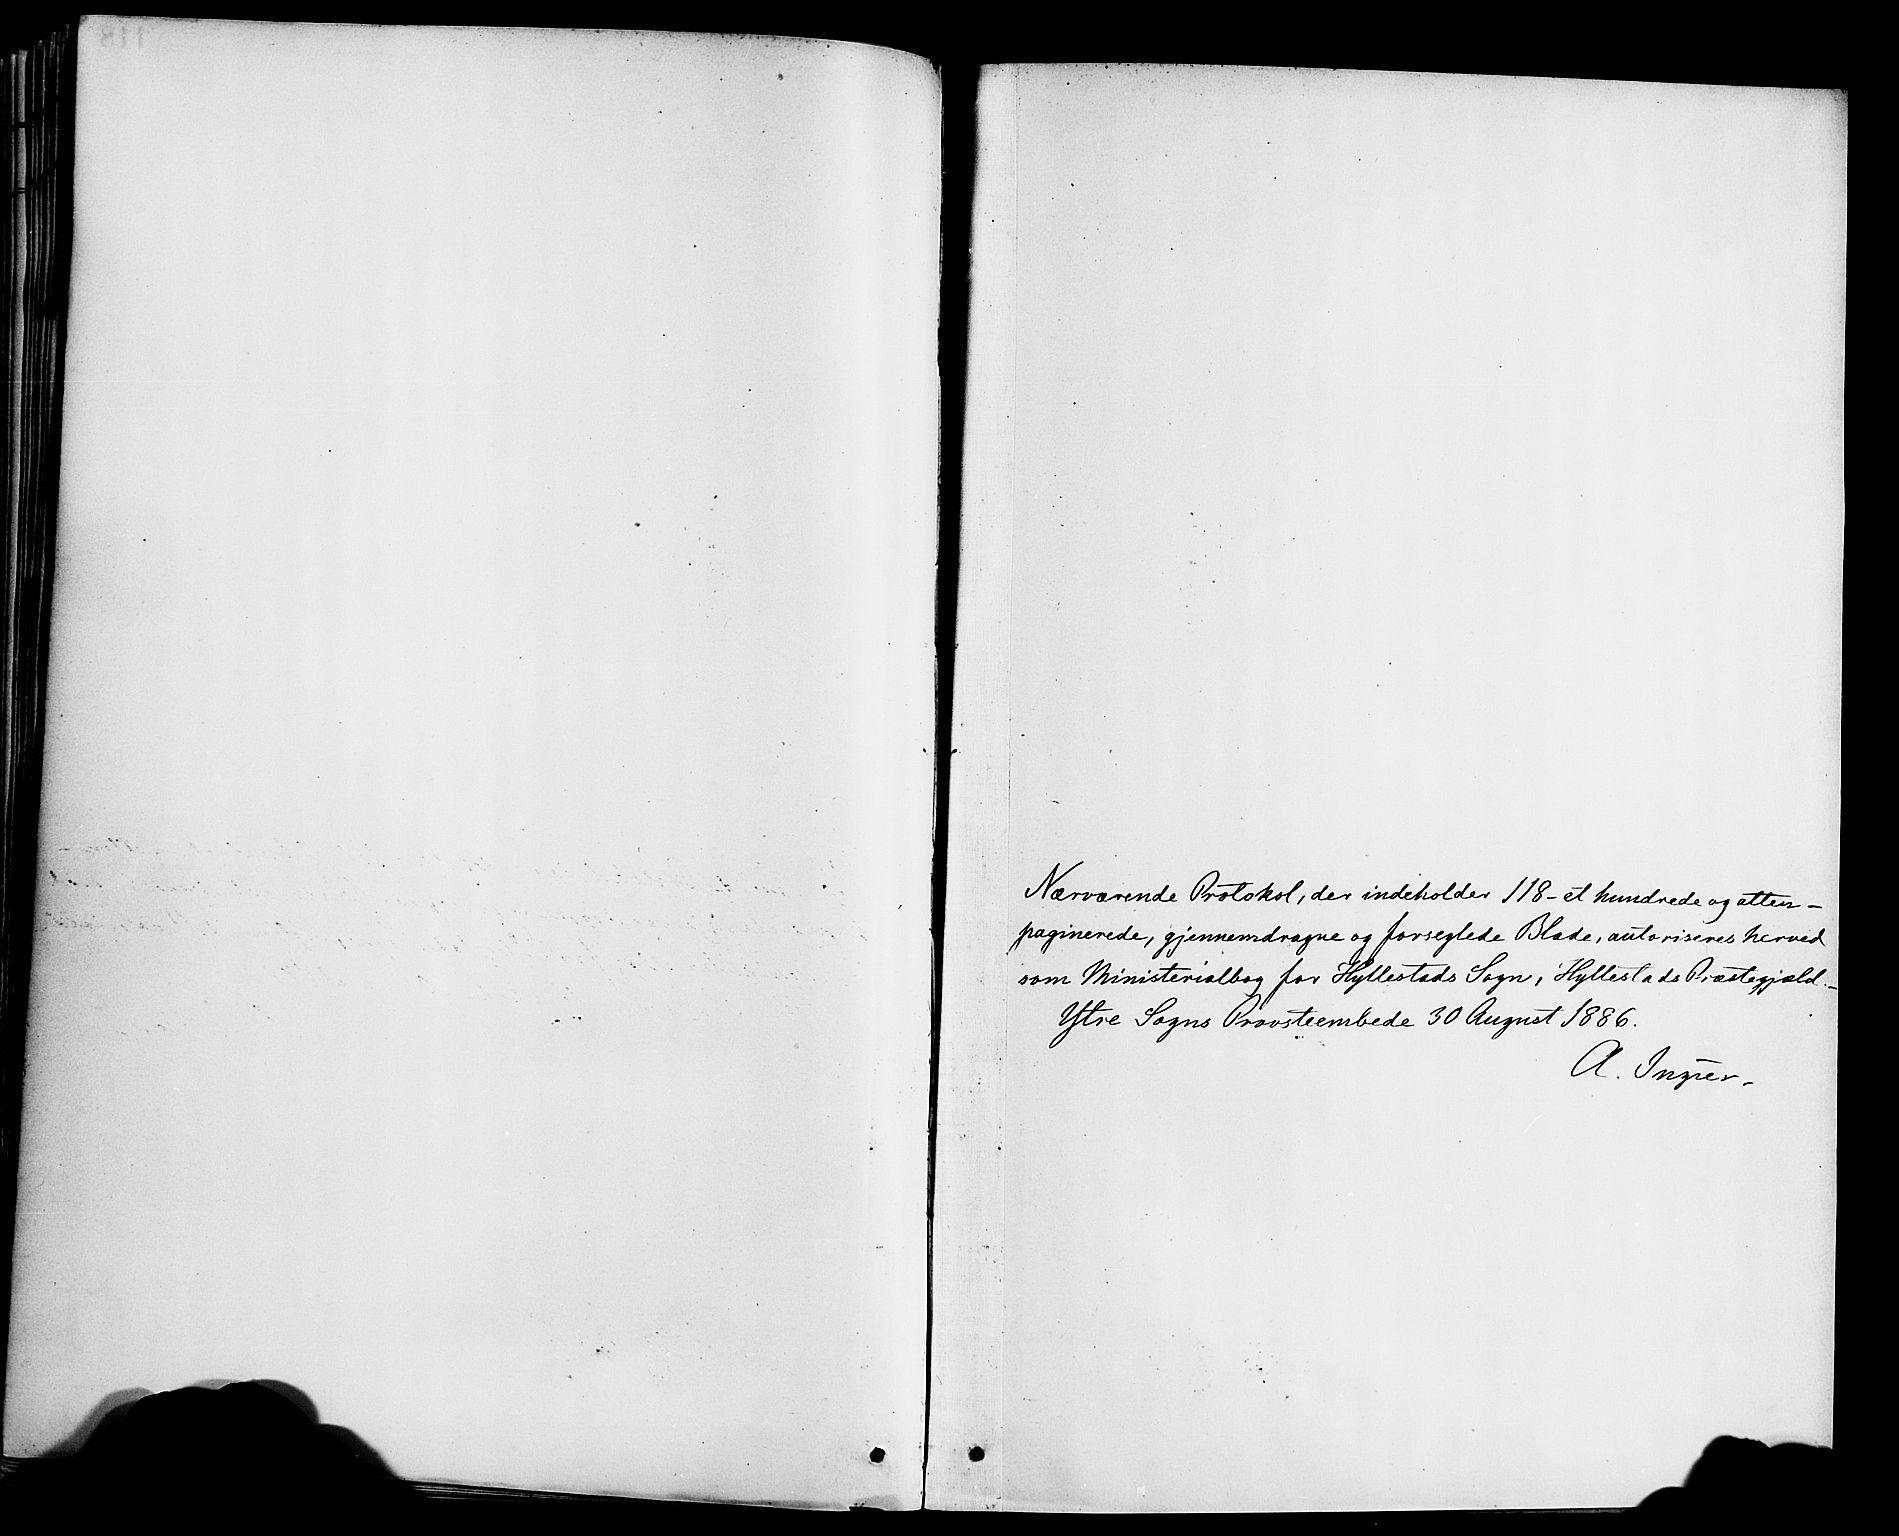 SAB, Hyllestad sokneprestembete, Ministerialbok nr. B 1, 1886-1904